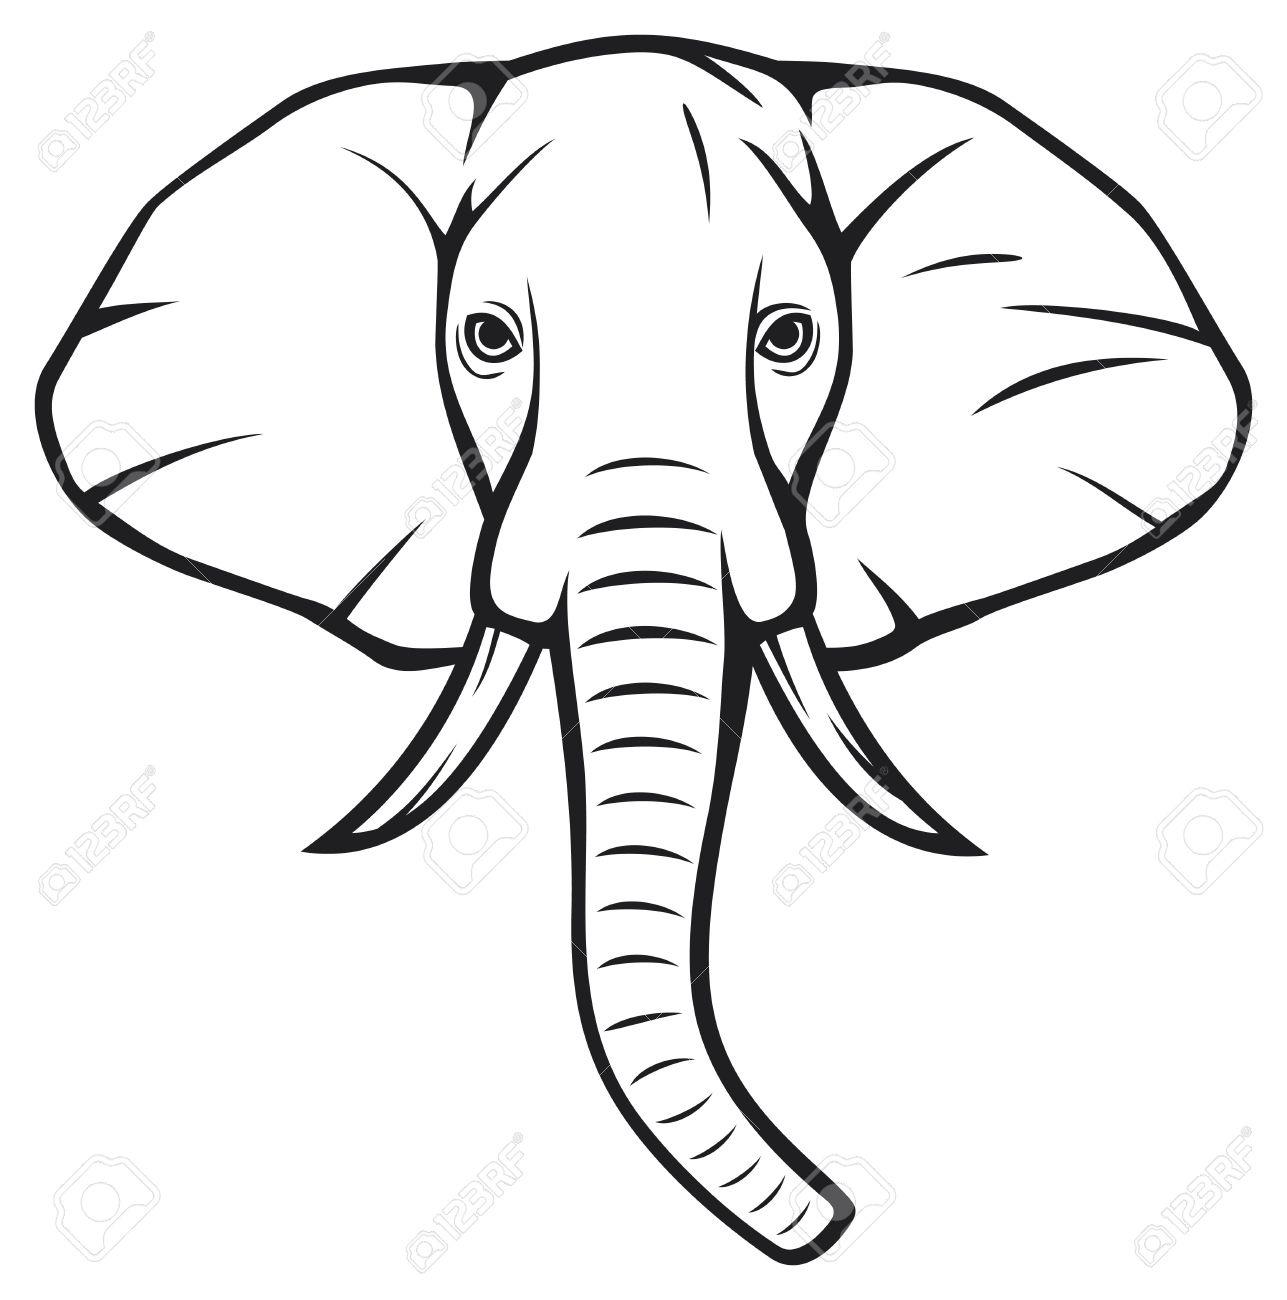 1287x1300 Elephant Head Clipart Black And White